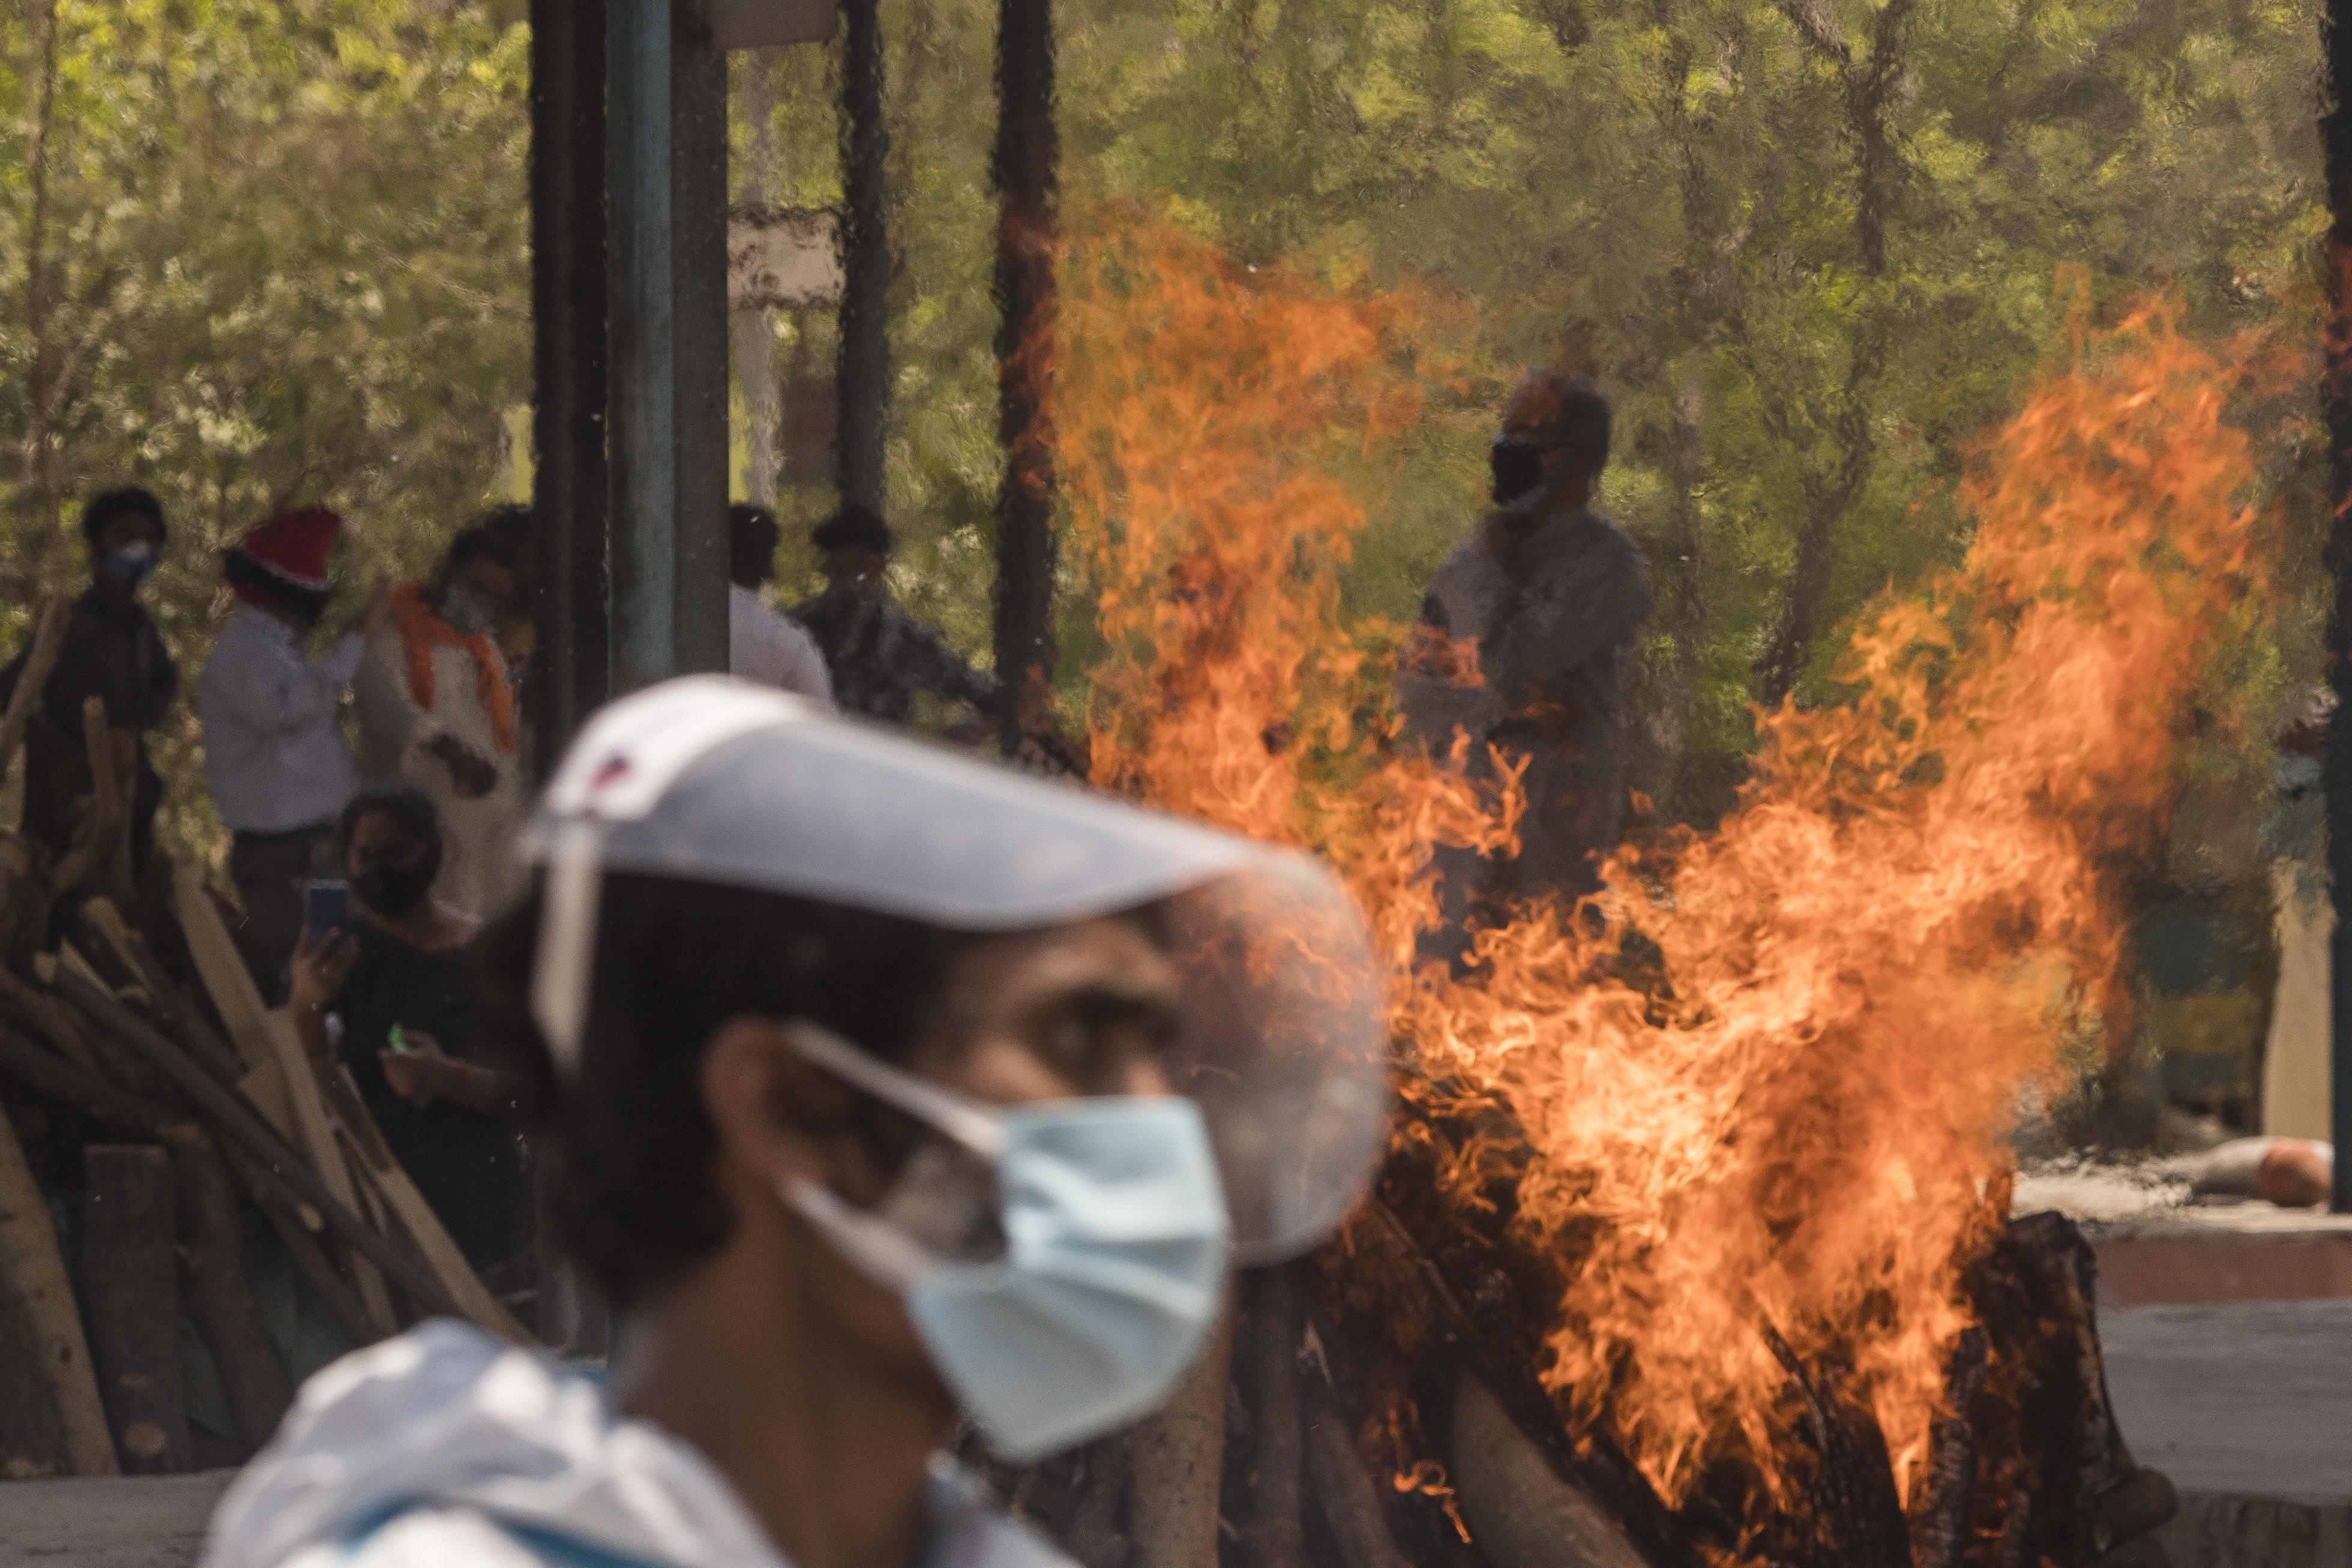 China 'Ready' to Help India in COVID-19 Crisis Amid U.S. Raw Materials Ban